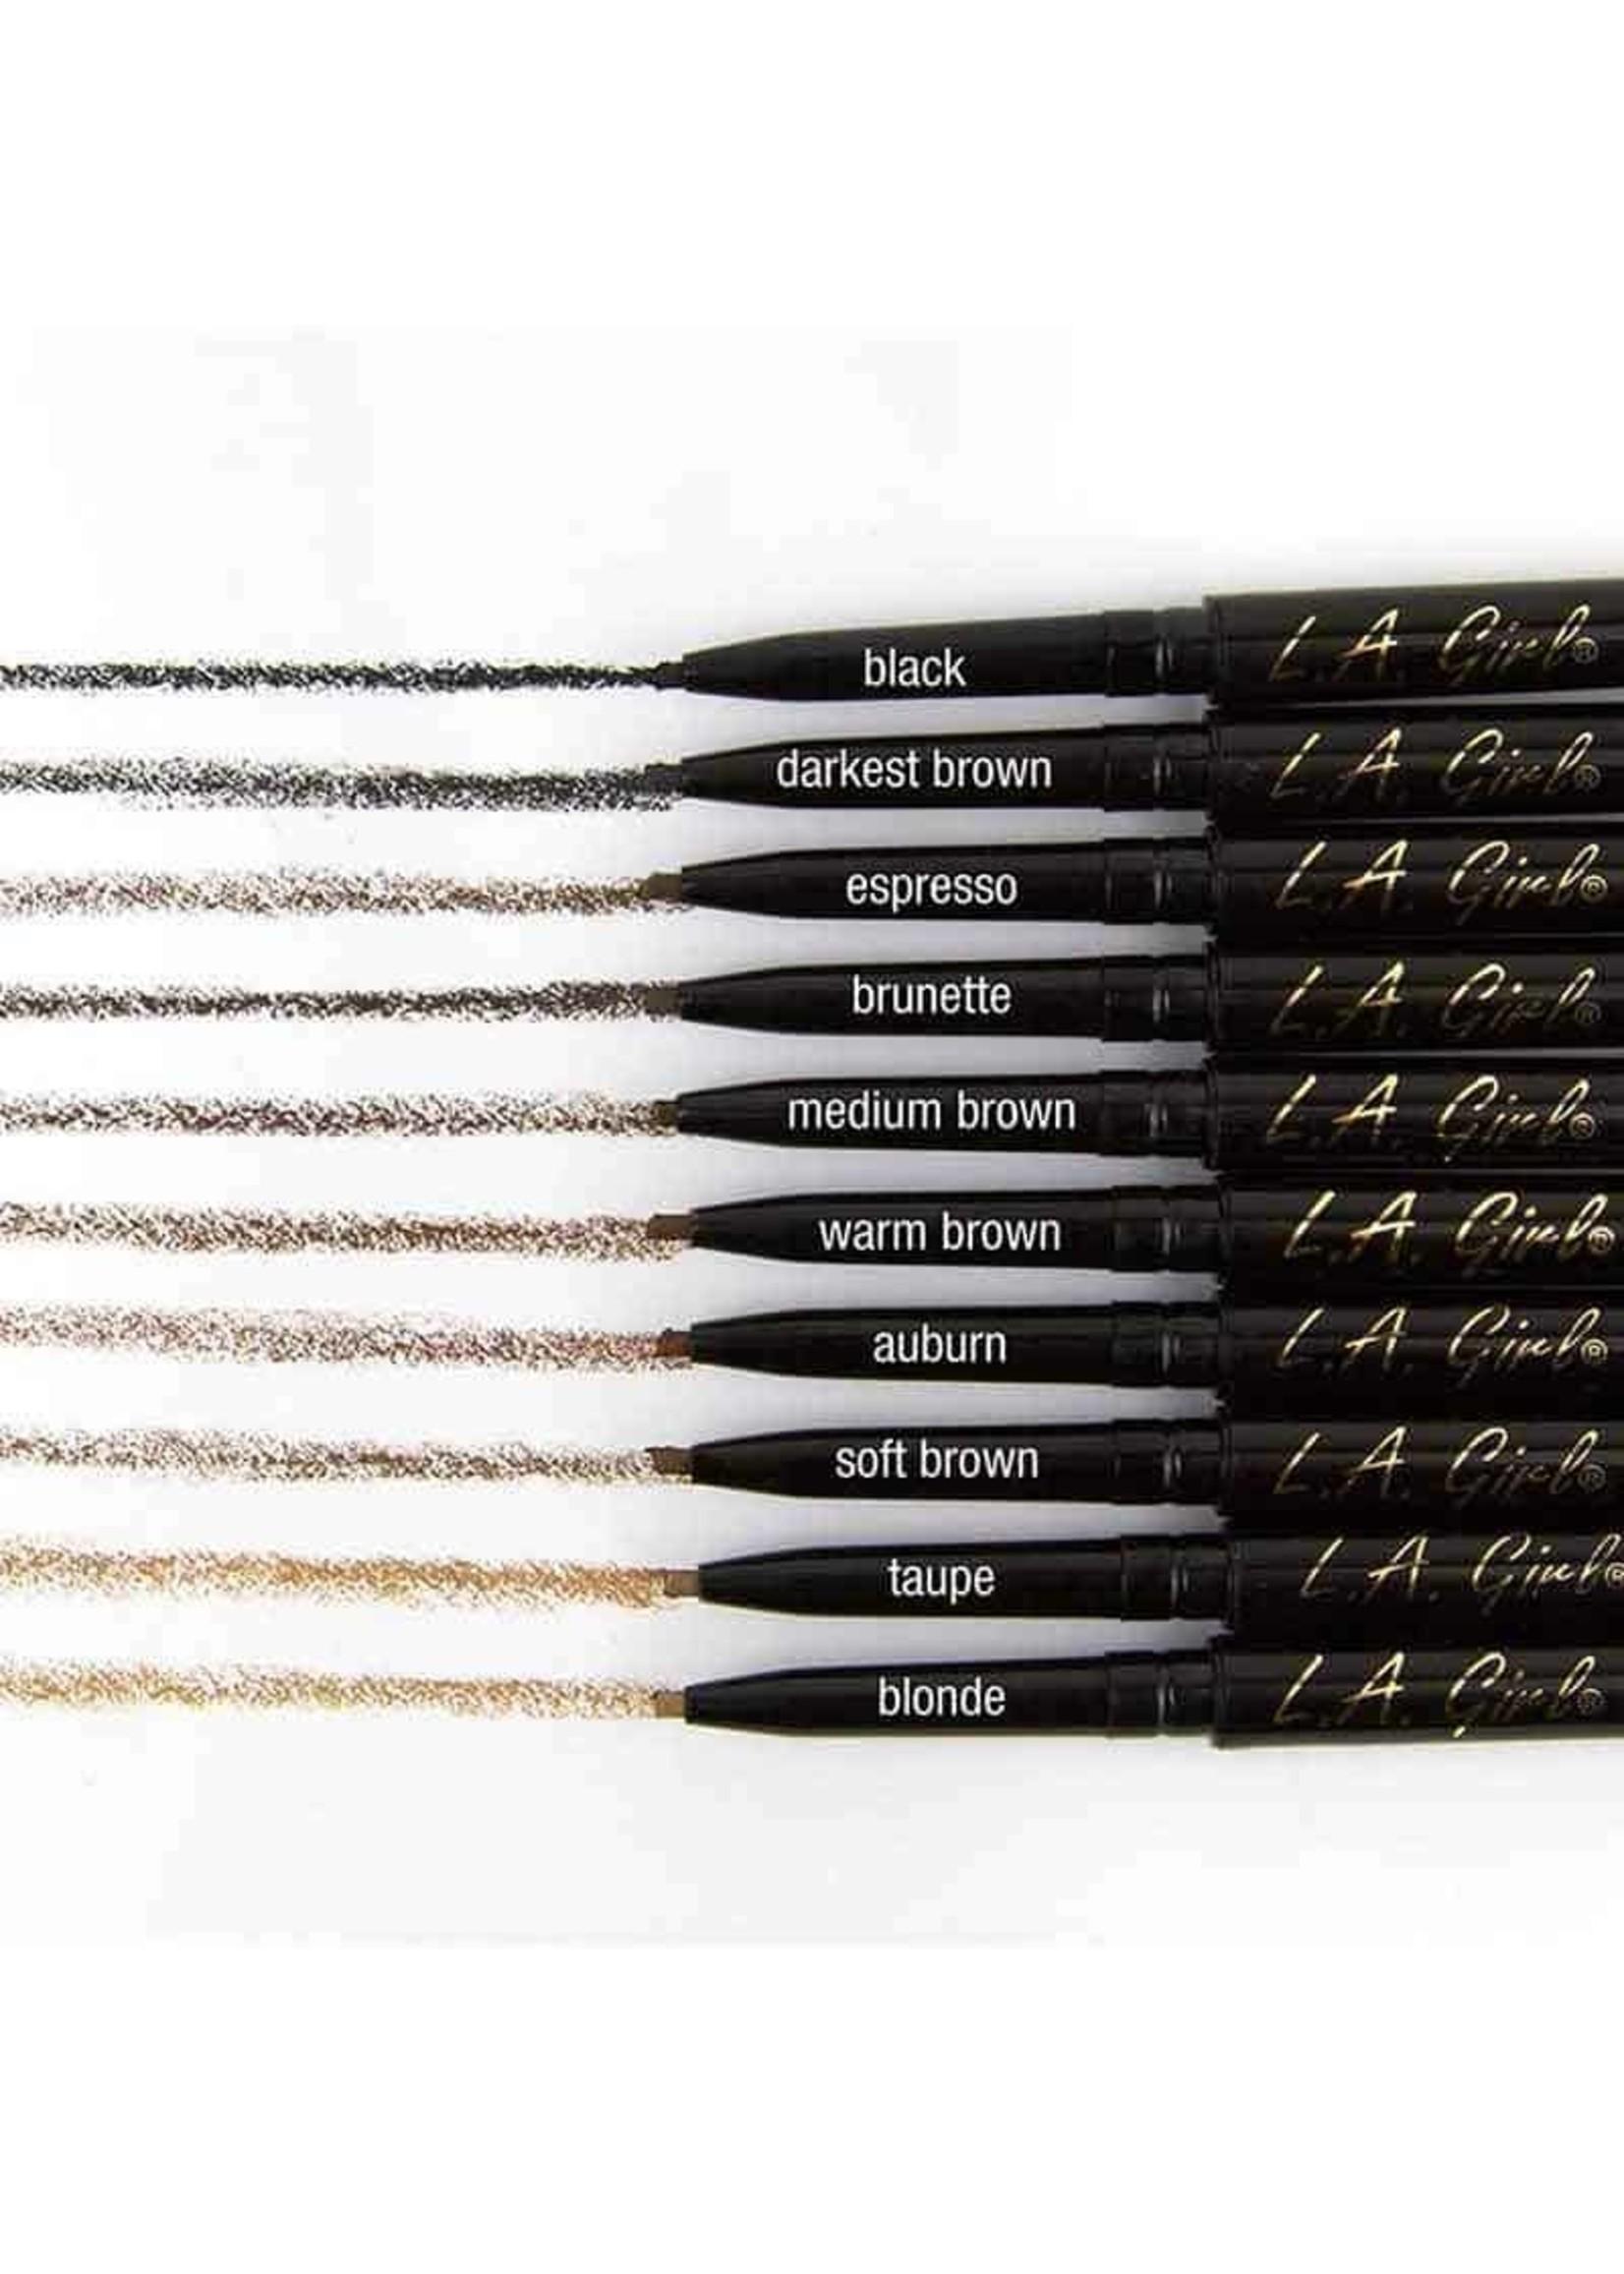 LA Girl Shady Slim Brow Pencil